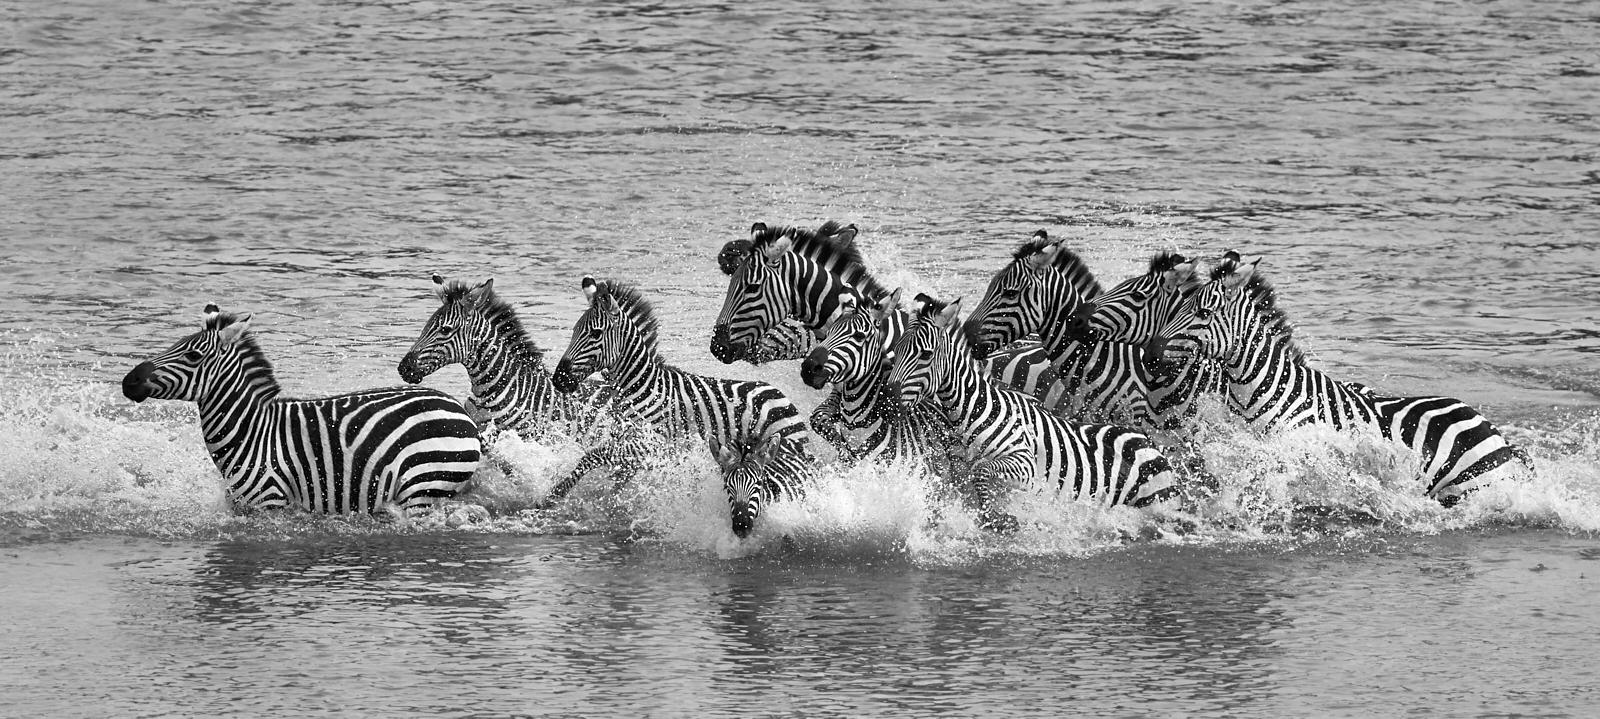 Running from crocodile mono 1600x1200 sRGB.jpg